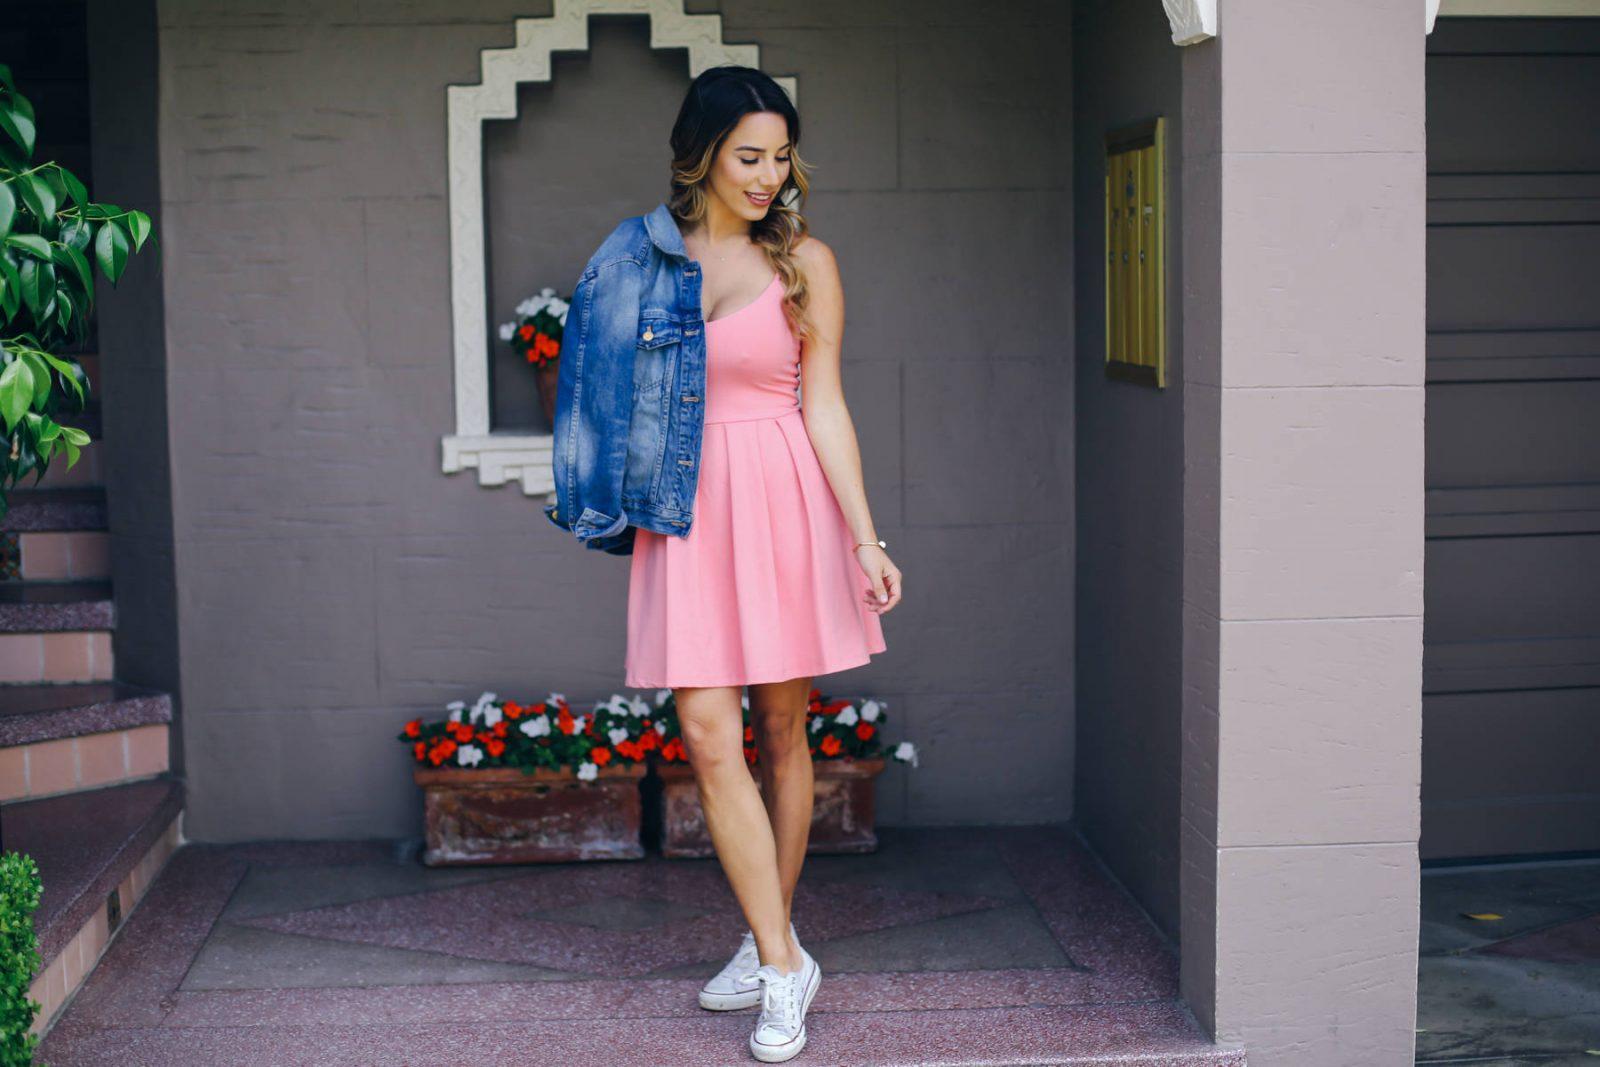 pink-skater-dress-ariana-lauren-fashionborn-san-francisco-ryanbyryanchua-8975